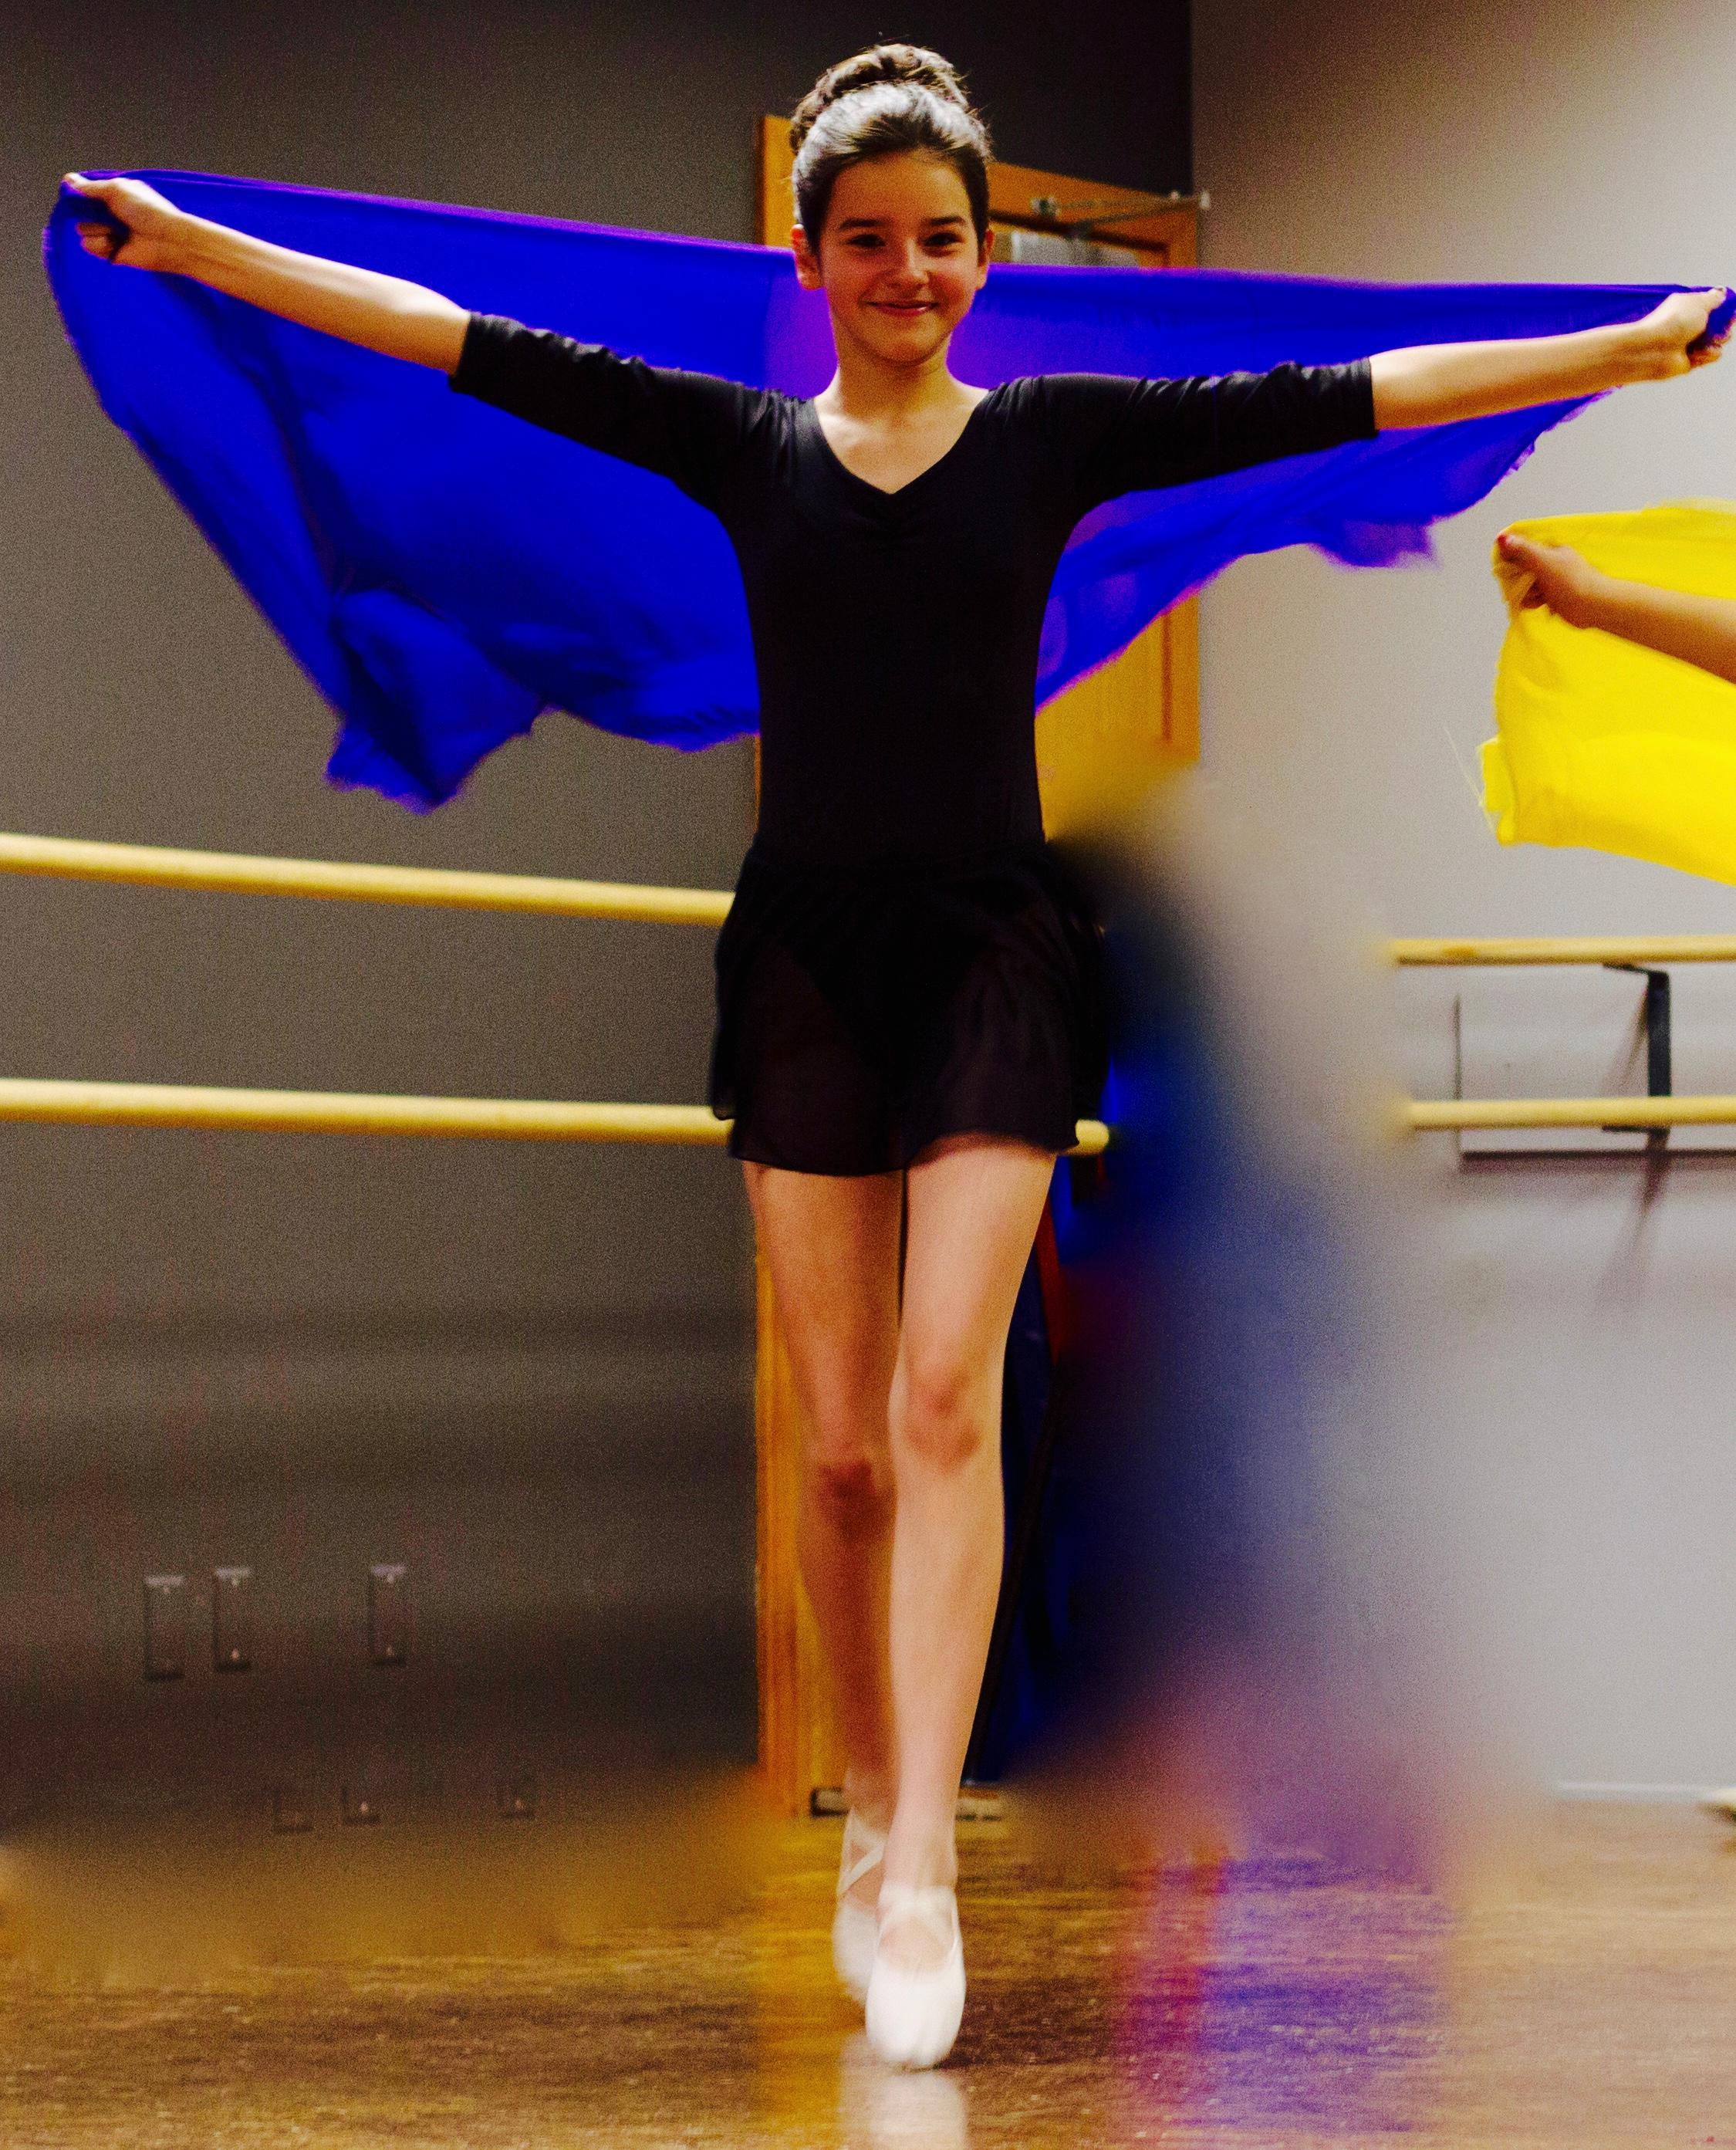 The 23rd Street Dance Company image 11